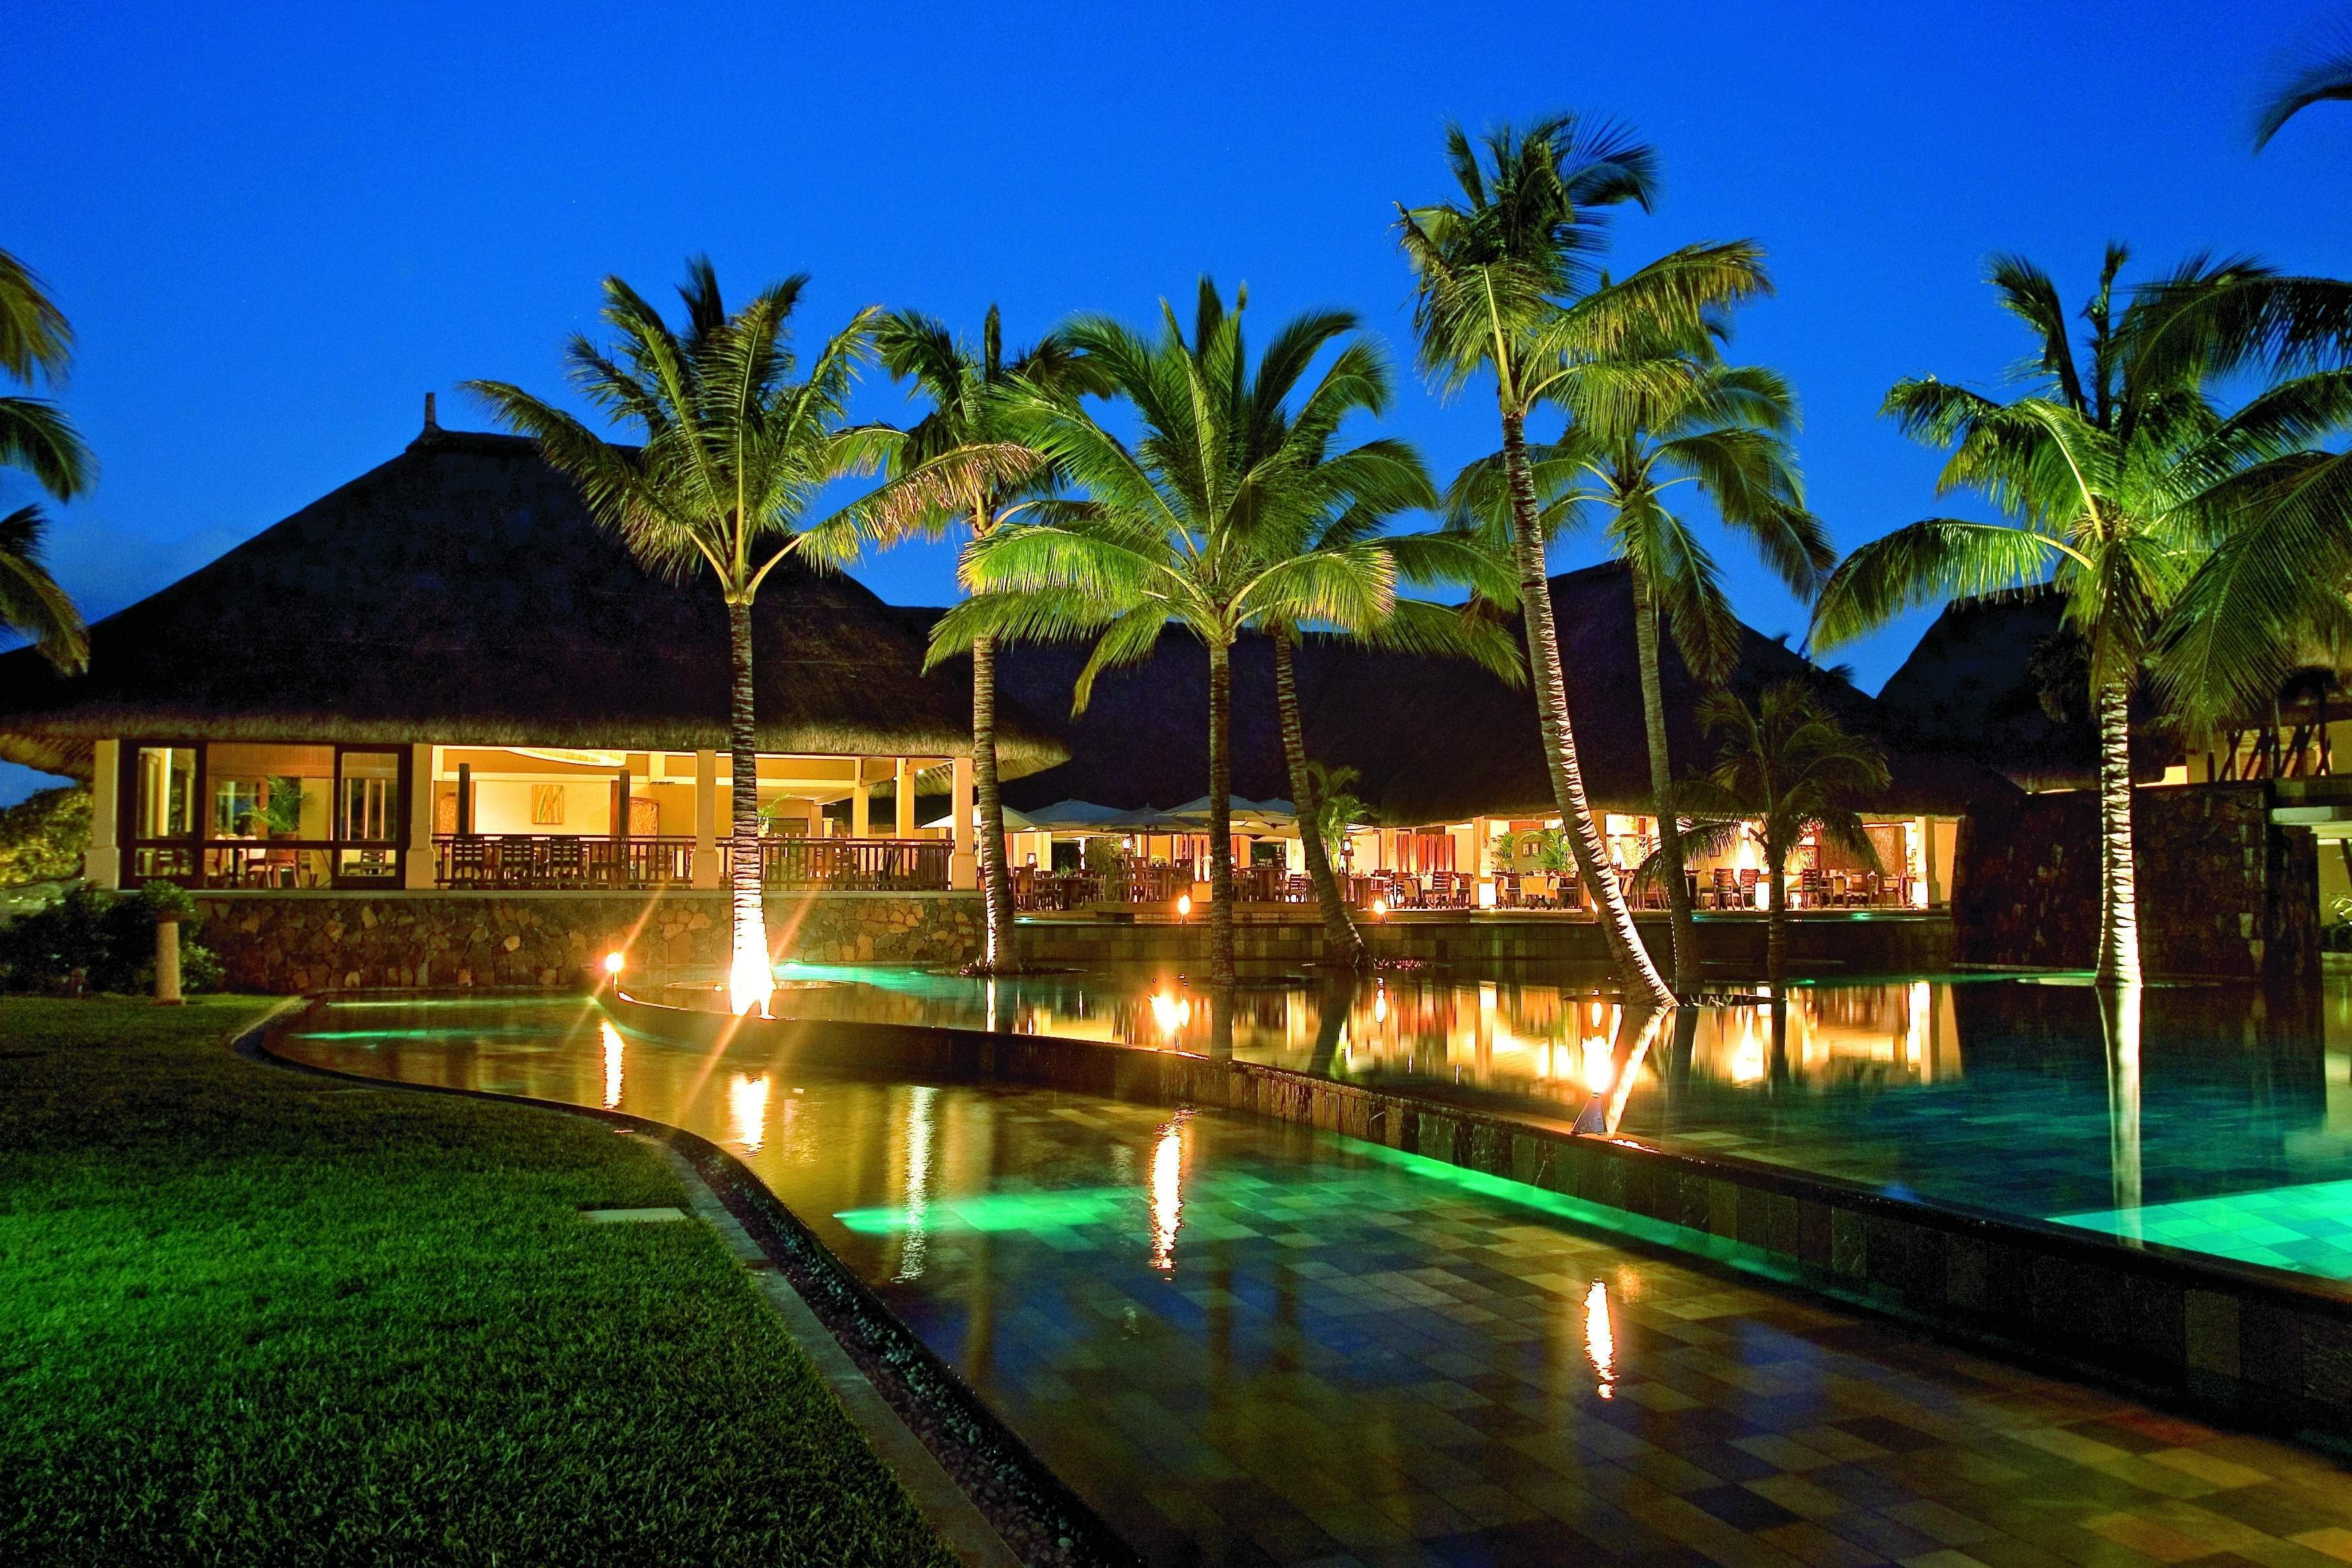 Mauricio - Hotel Constance Belle Mare Plage Resort Golf & Spa